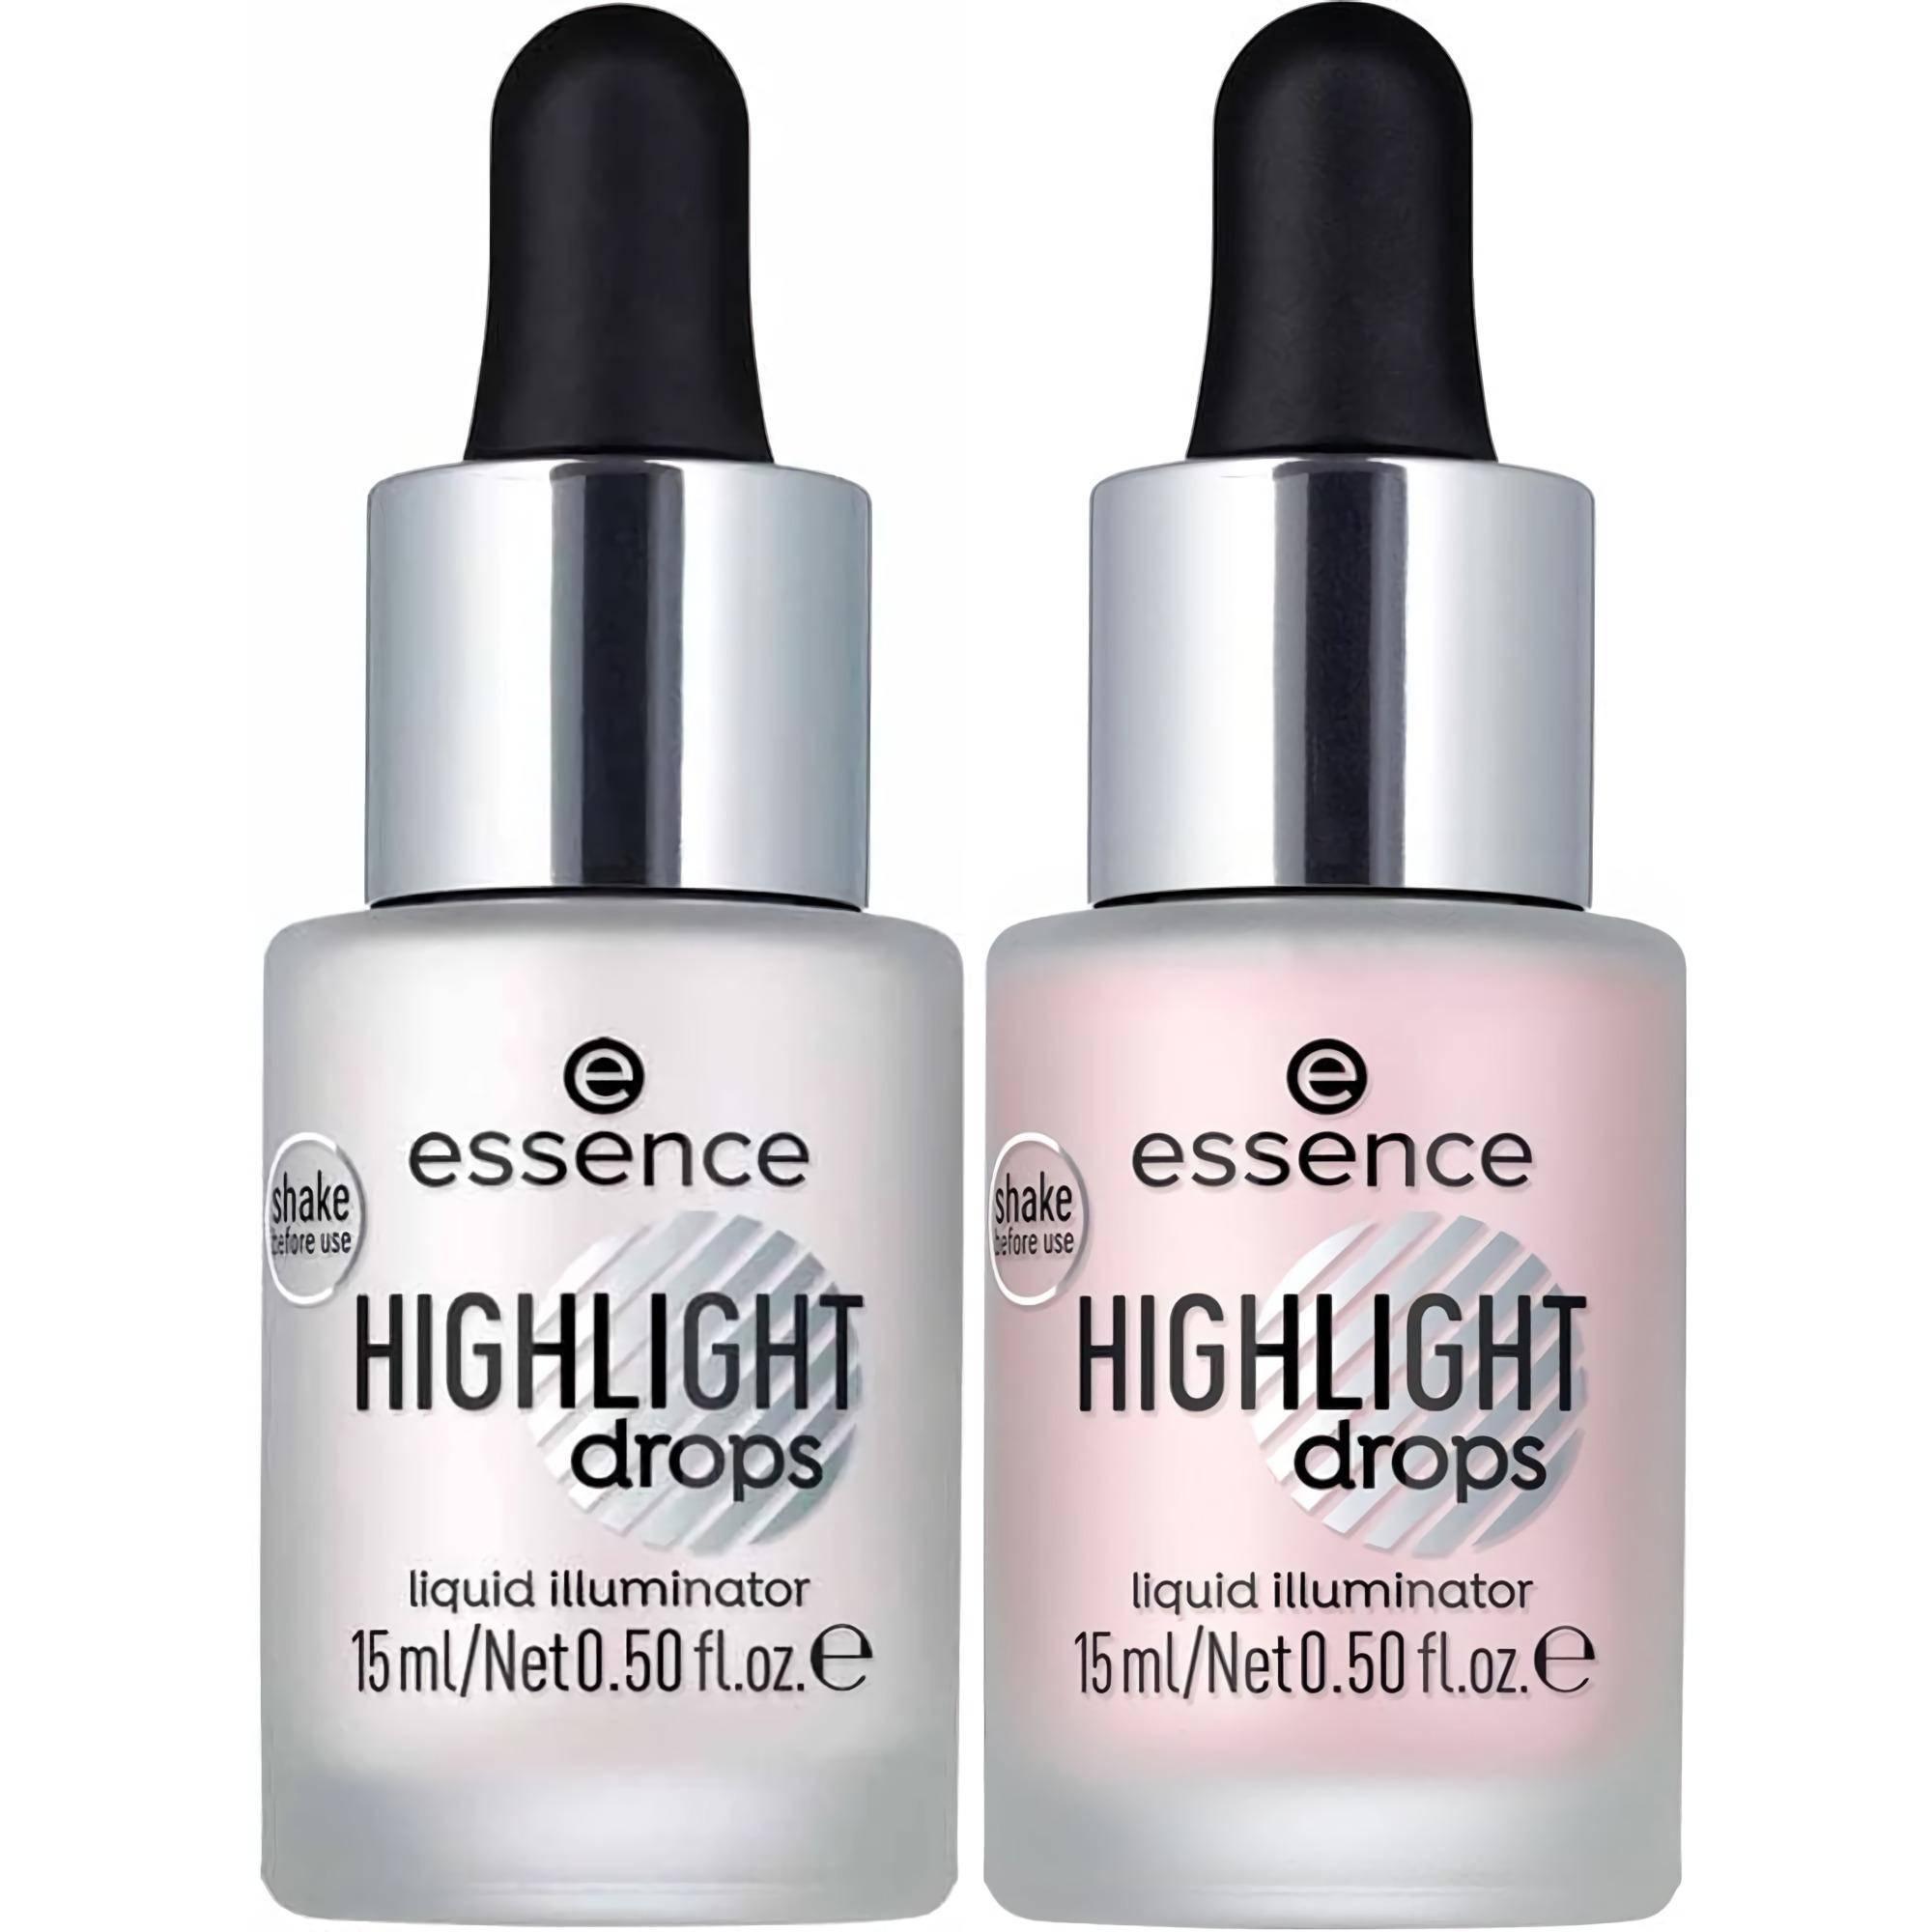 Essence Highlight drops liquid illuminatorEssence Highlight drops liquid illuminator